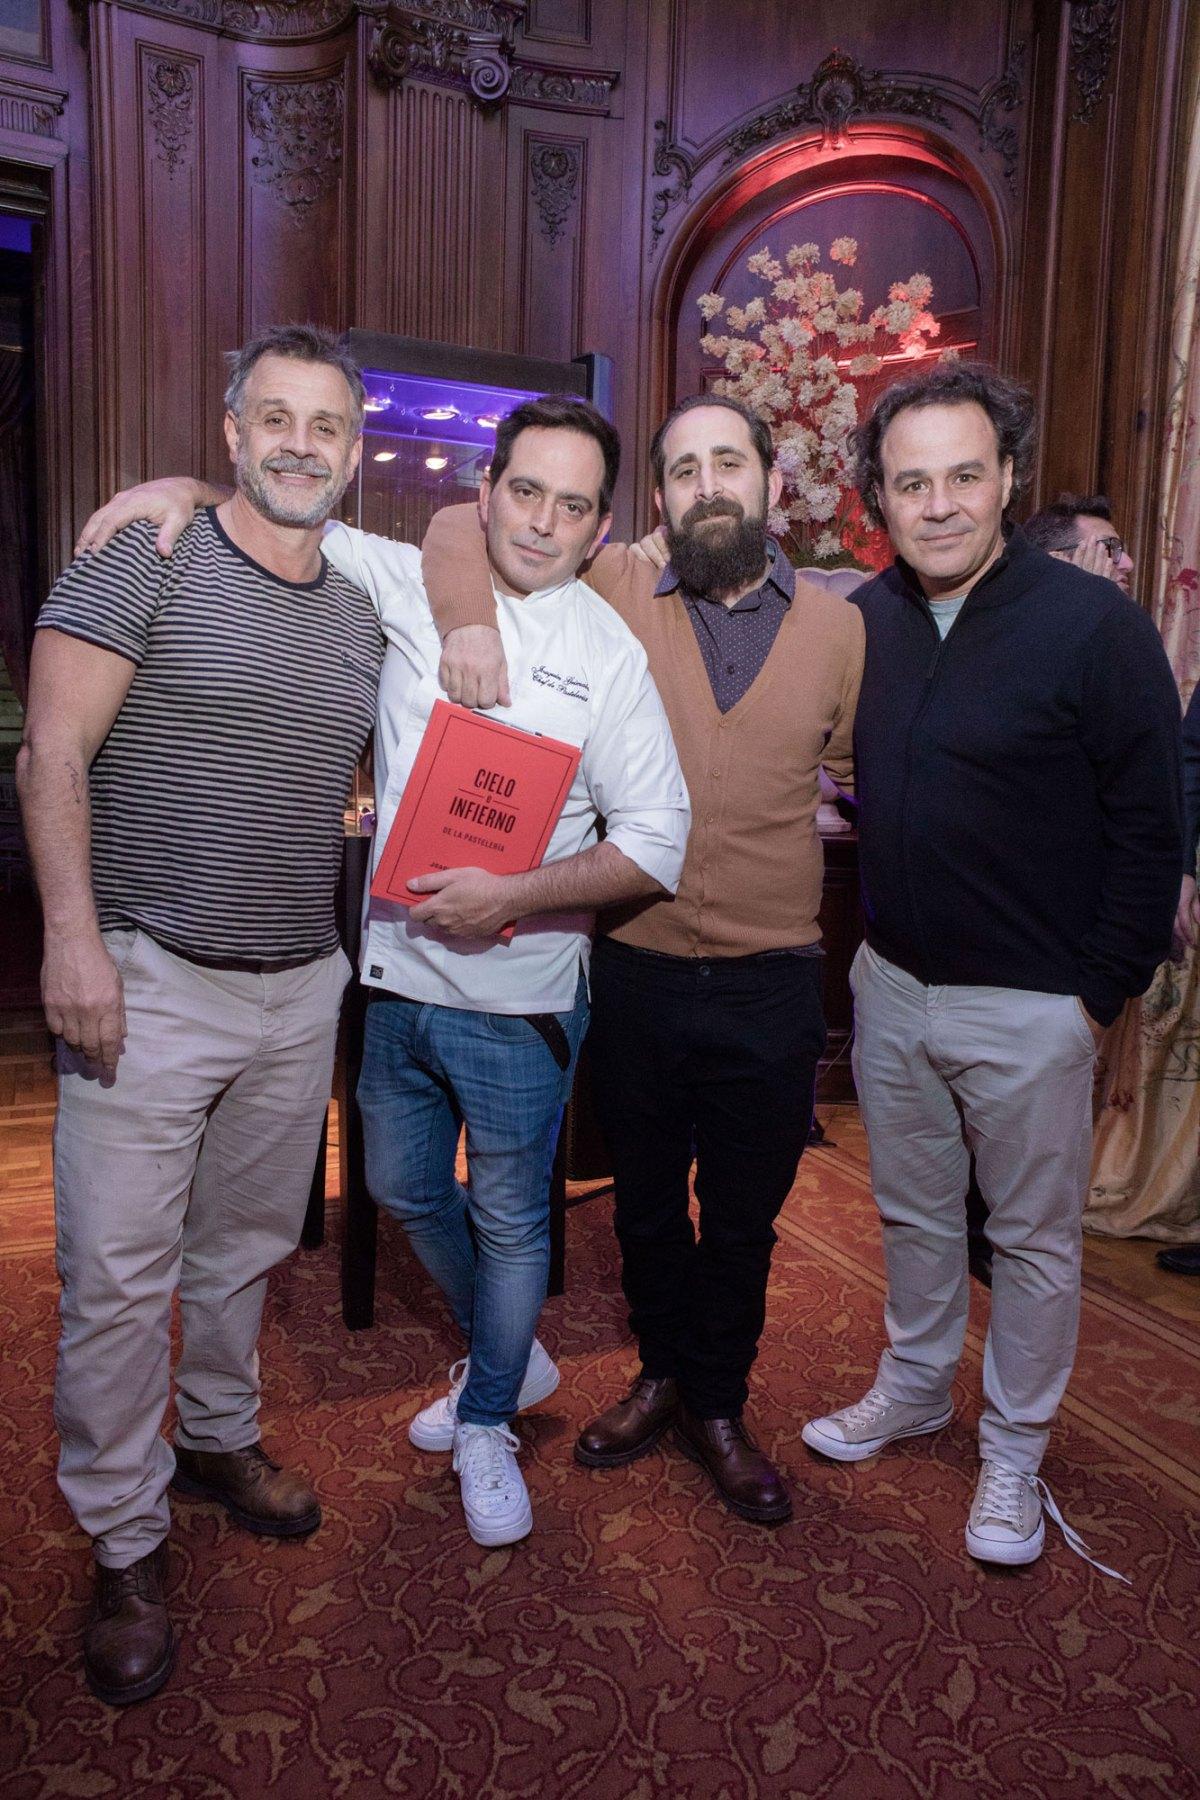 Cristian-Petersen-Joaquin-Grimaldi-Valentin-Grimaldi-y-Roberto-Petersen